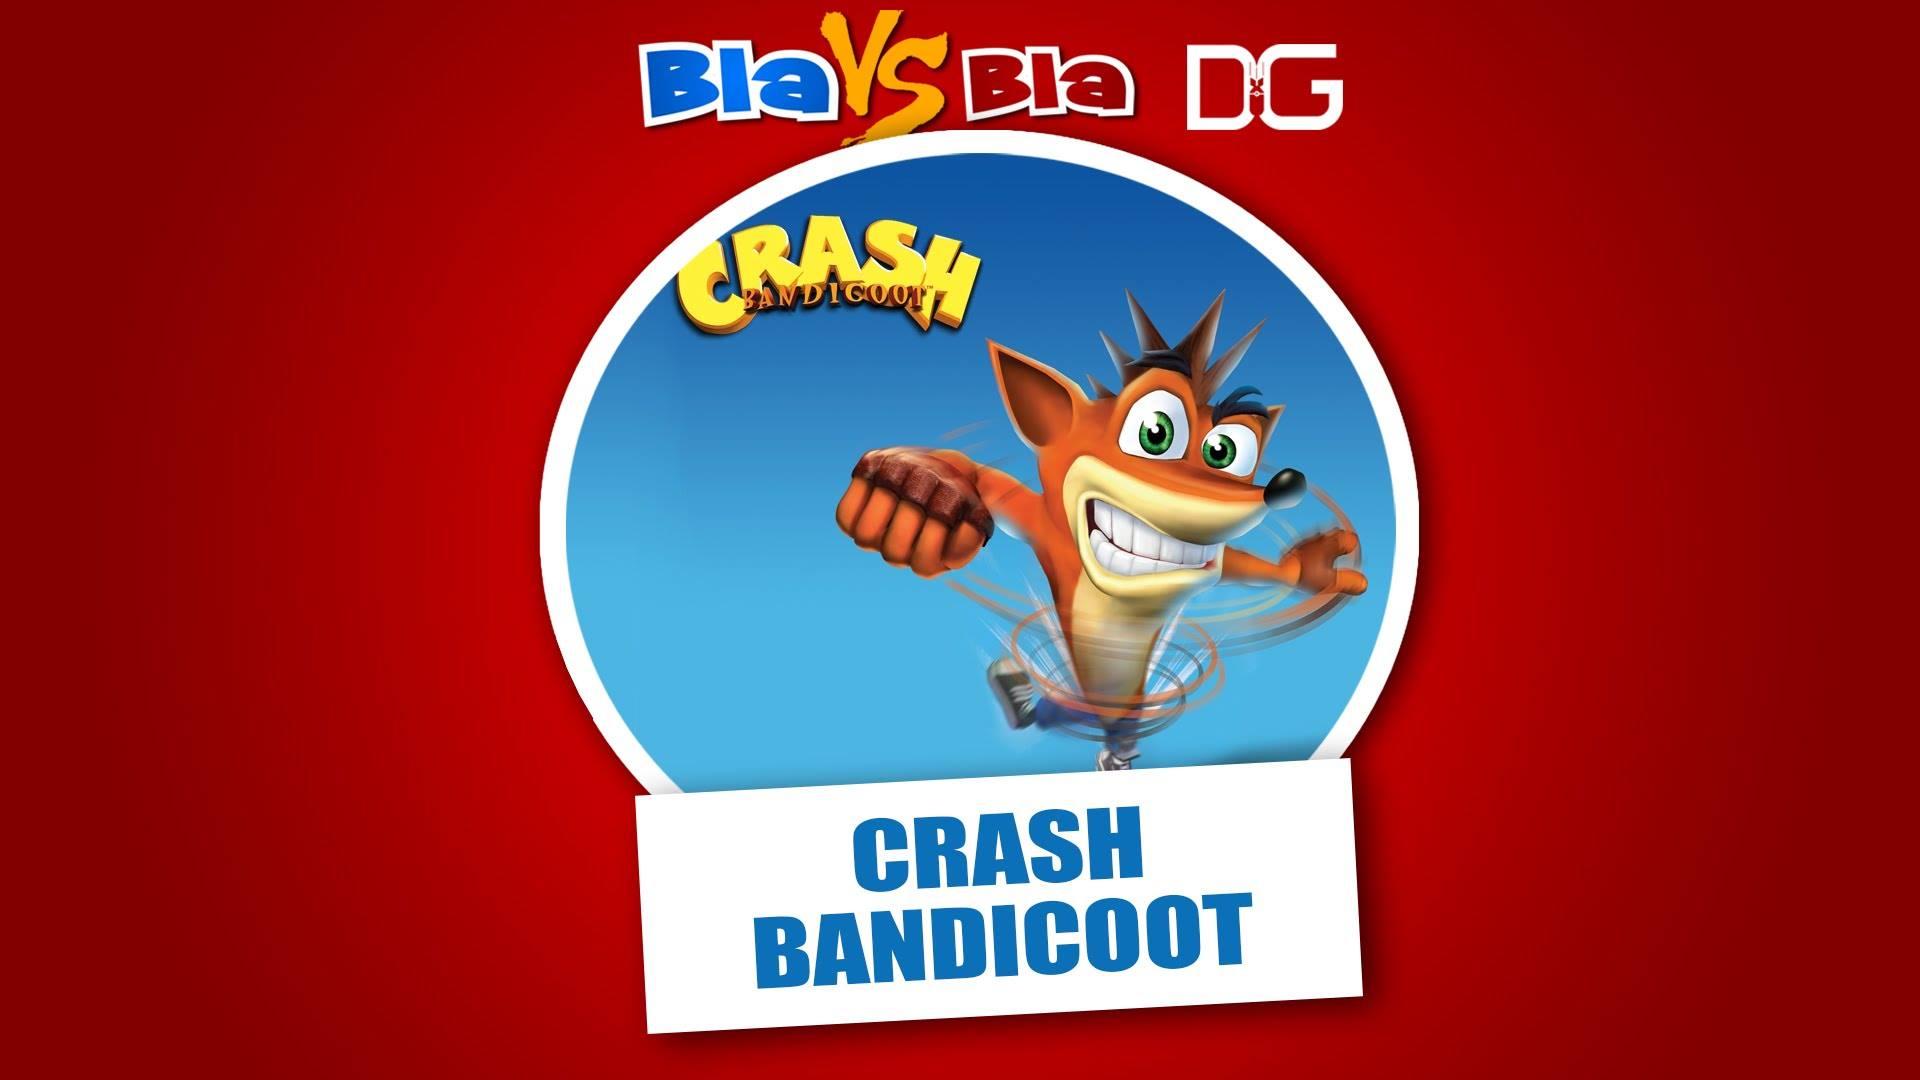 Bla vs Bla - Crash Bandicoot - DG - Imagem